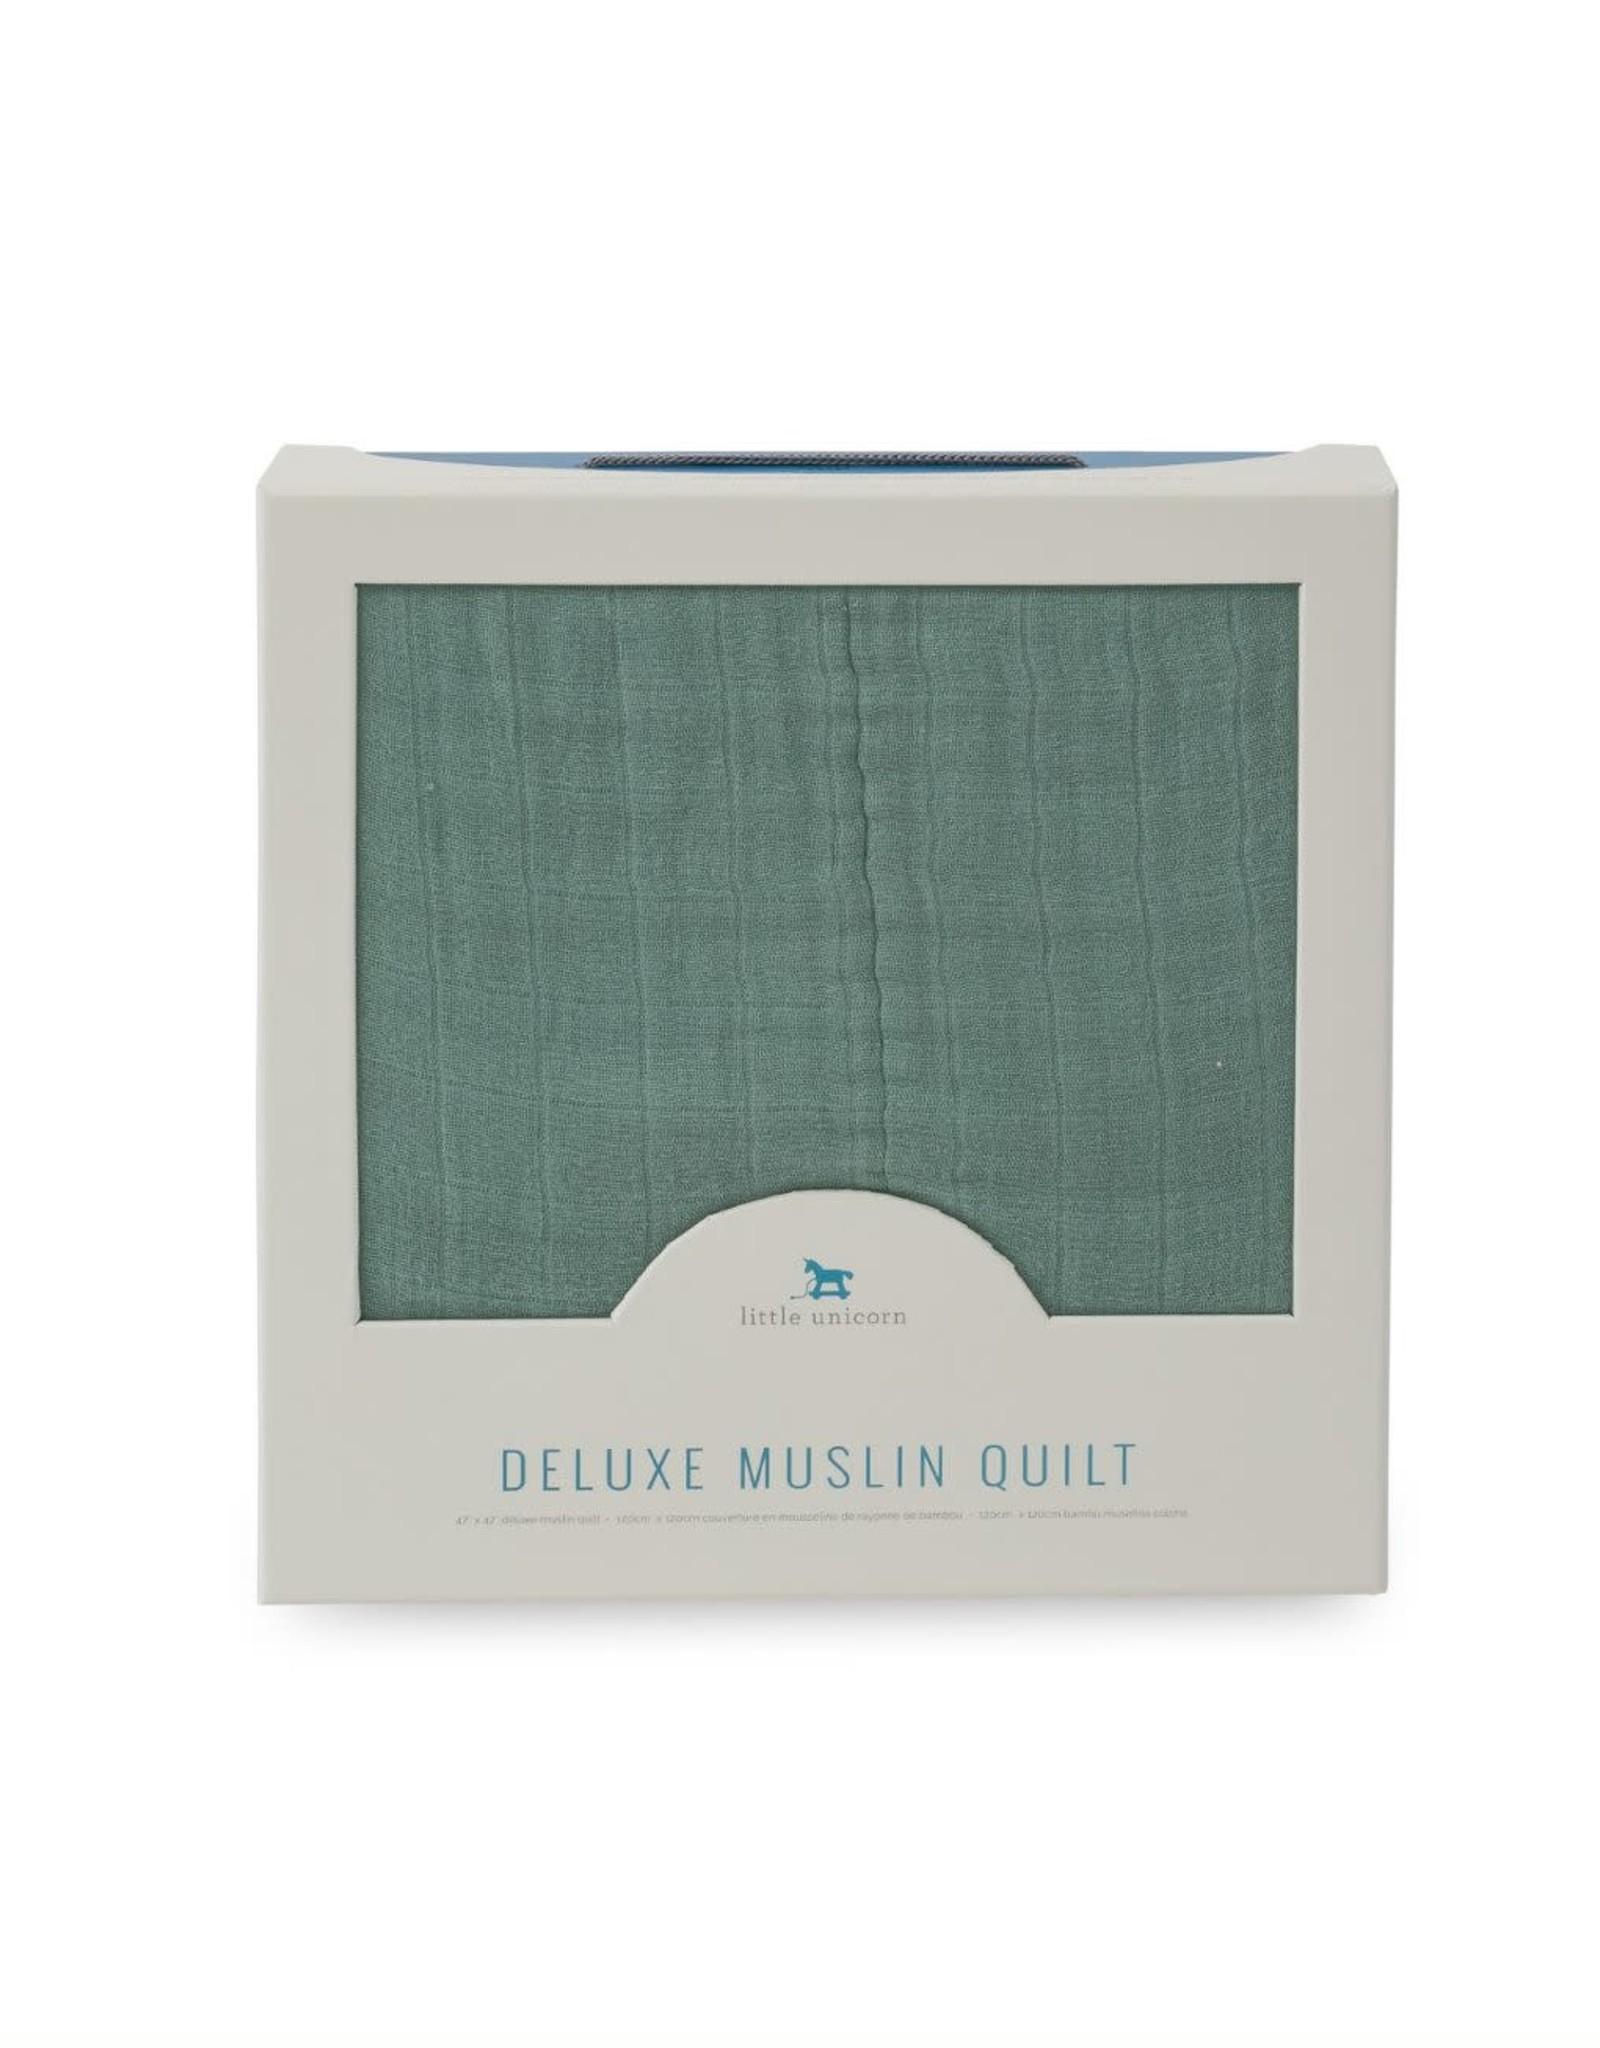 Little Unicorn deluxe muslin quilt- sage